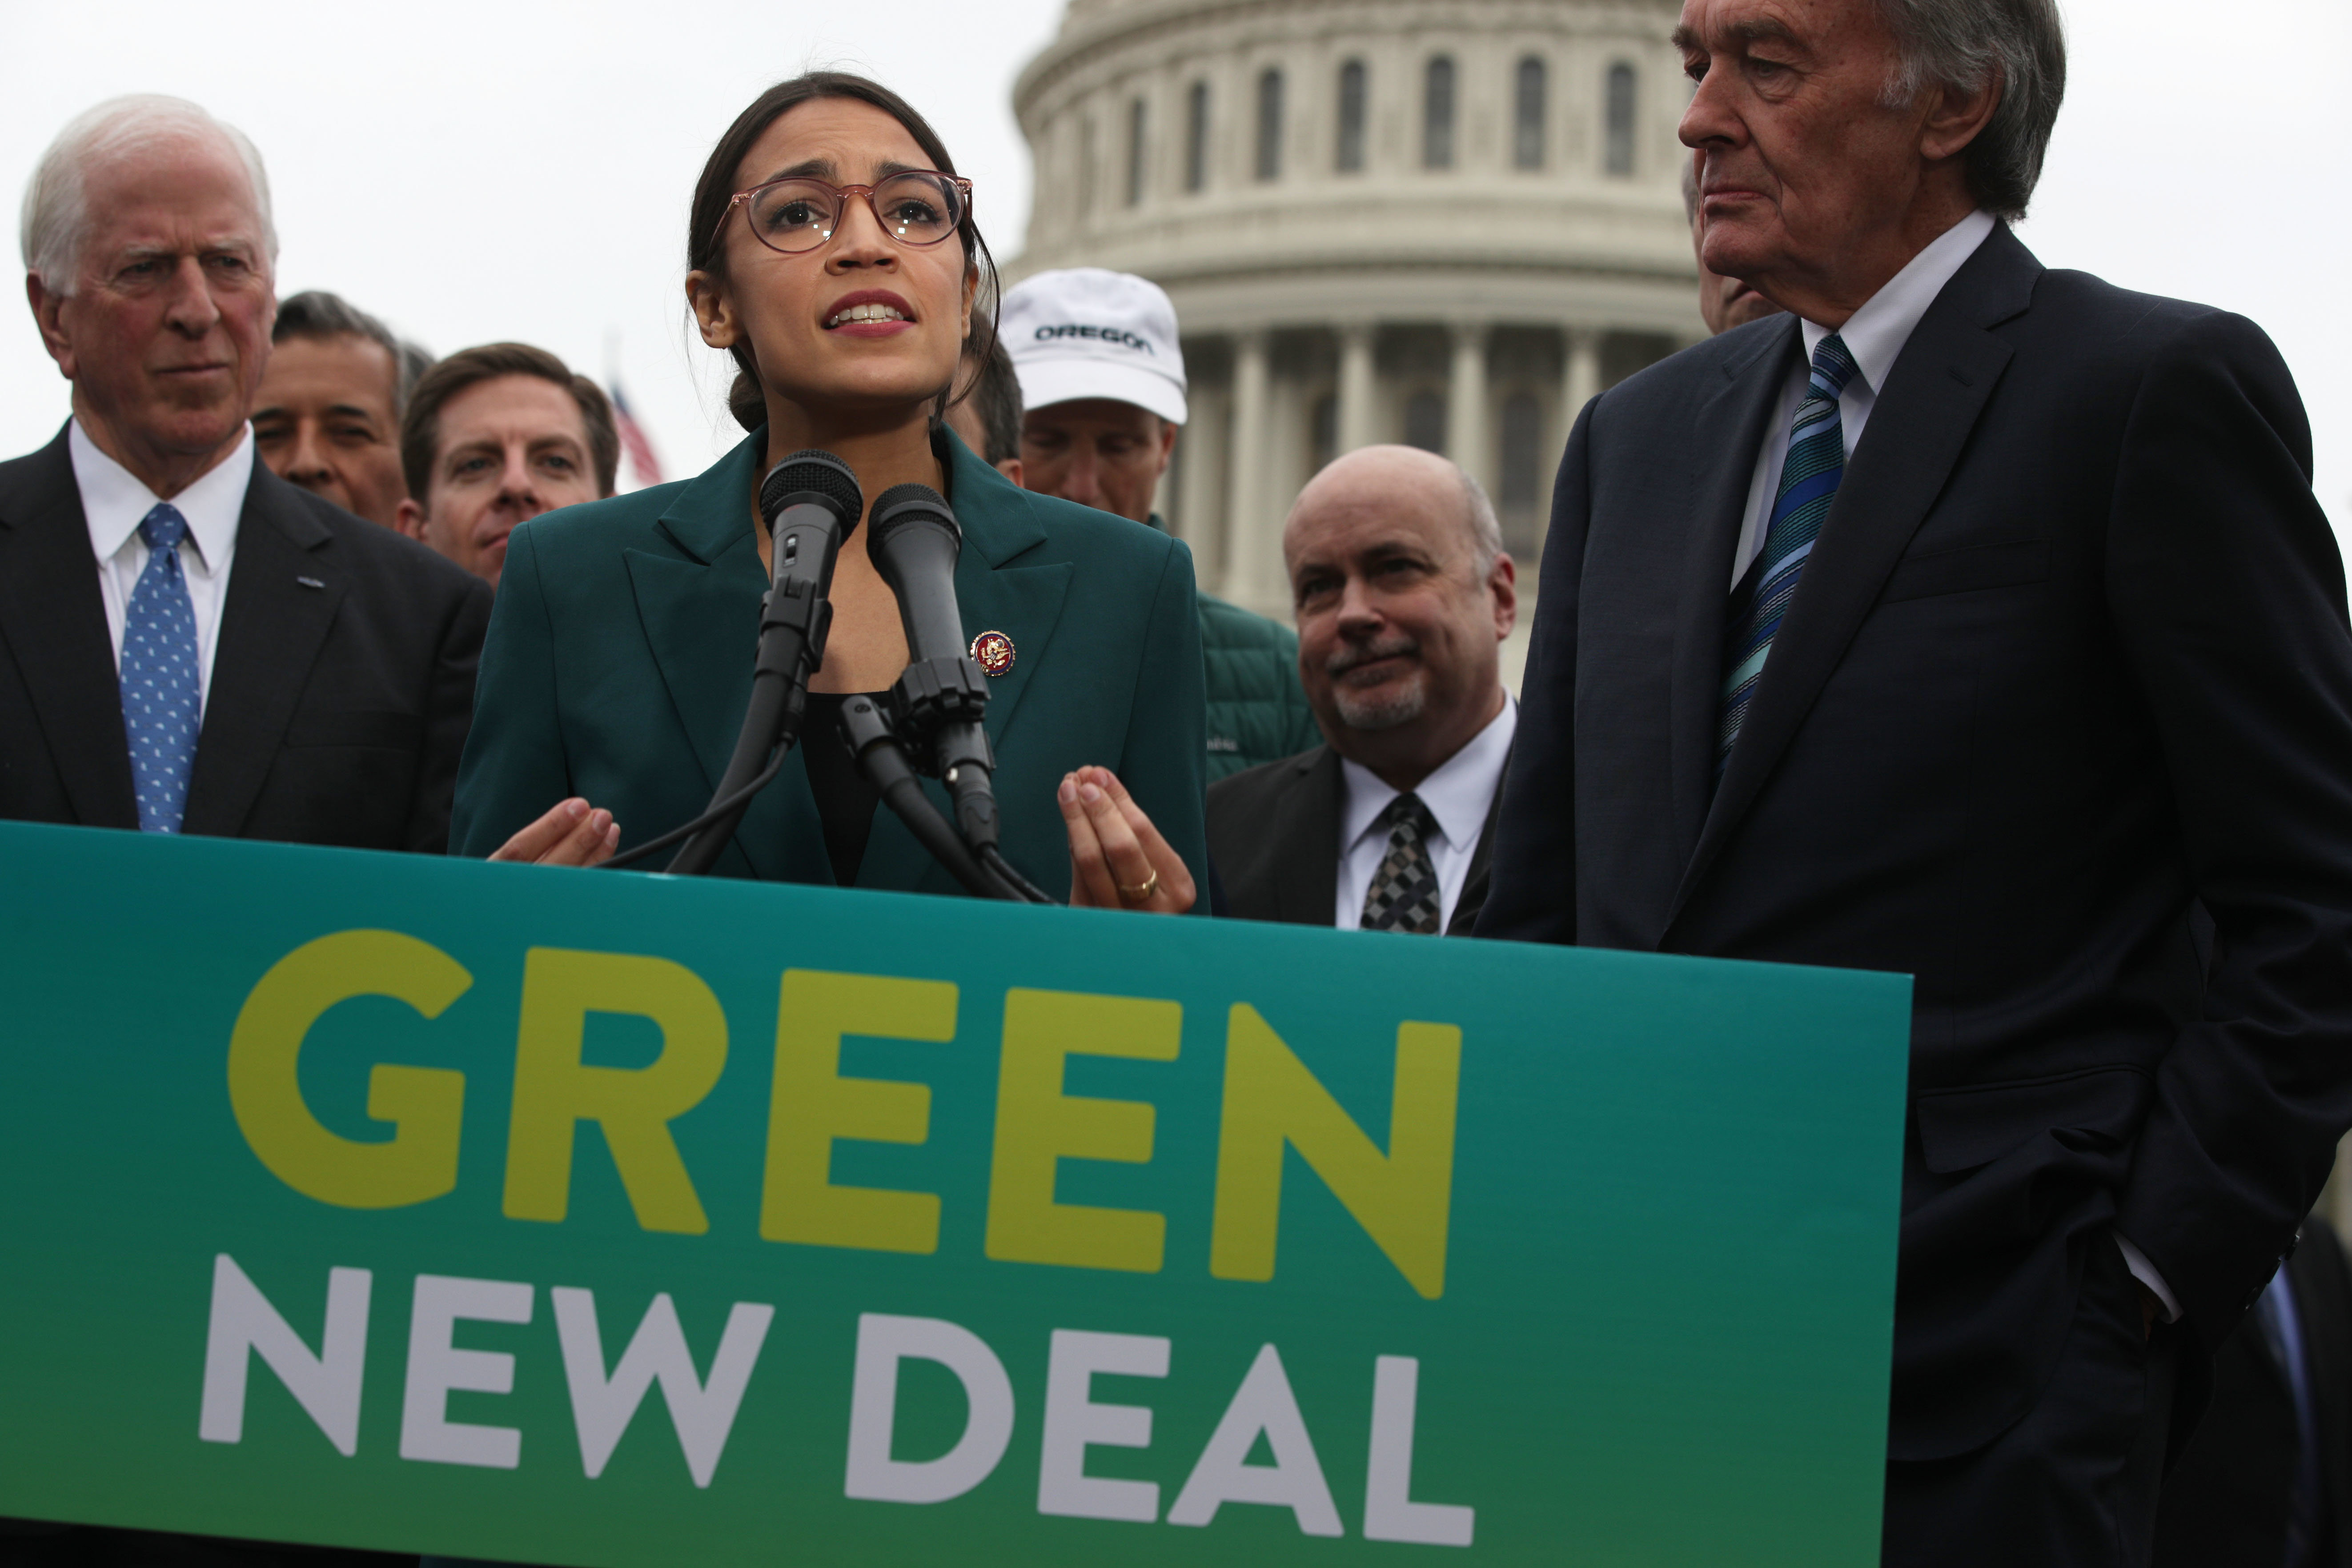 Rep. Alexandria Ocasio-Cortez and Sen. Ed Markey (far right) unveil their resolution for a Green New Deal in Washington in Fe